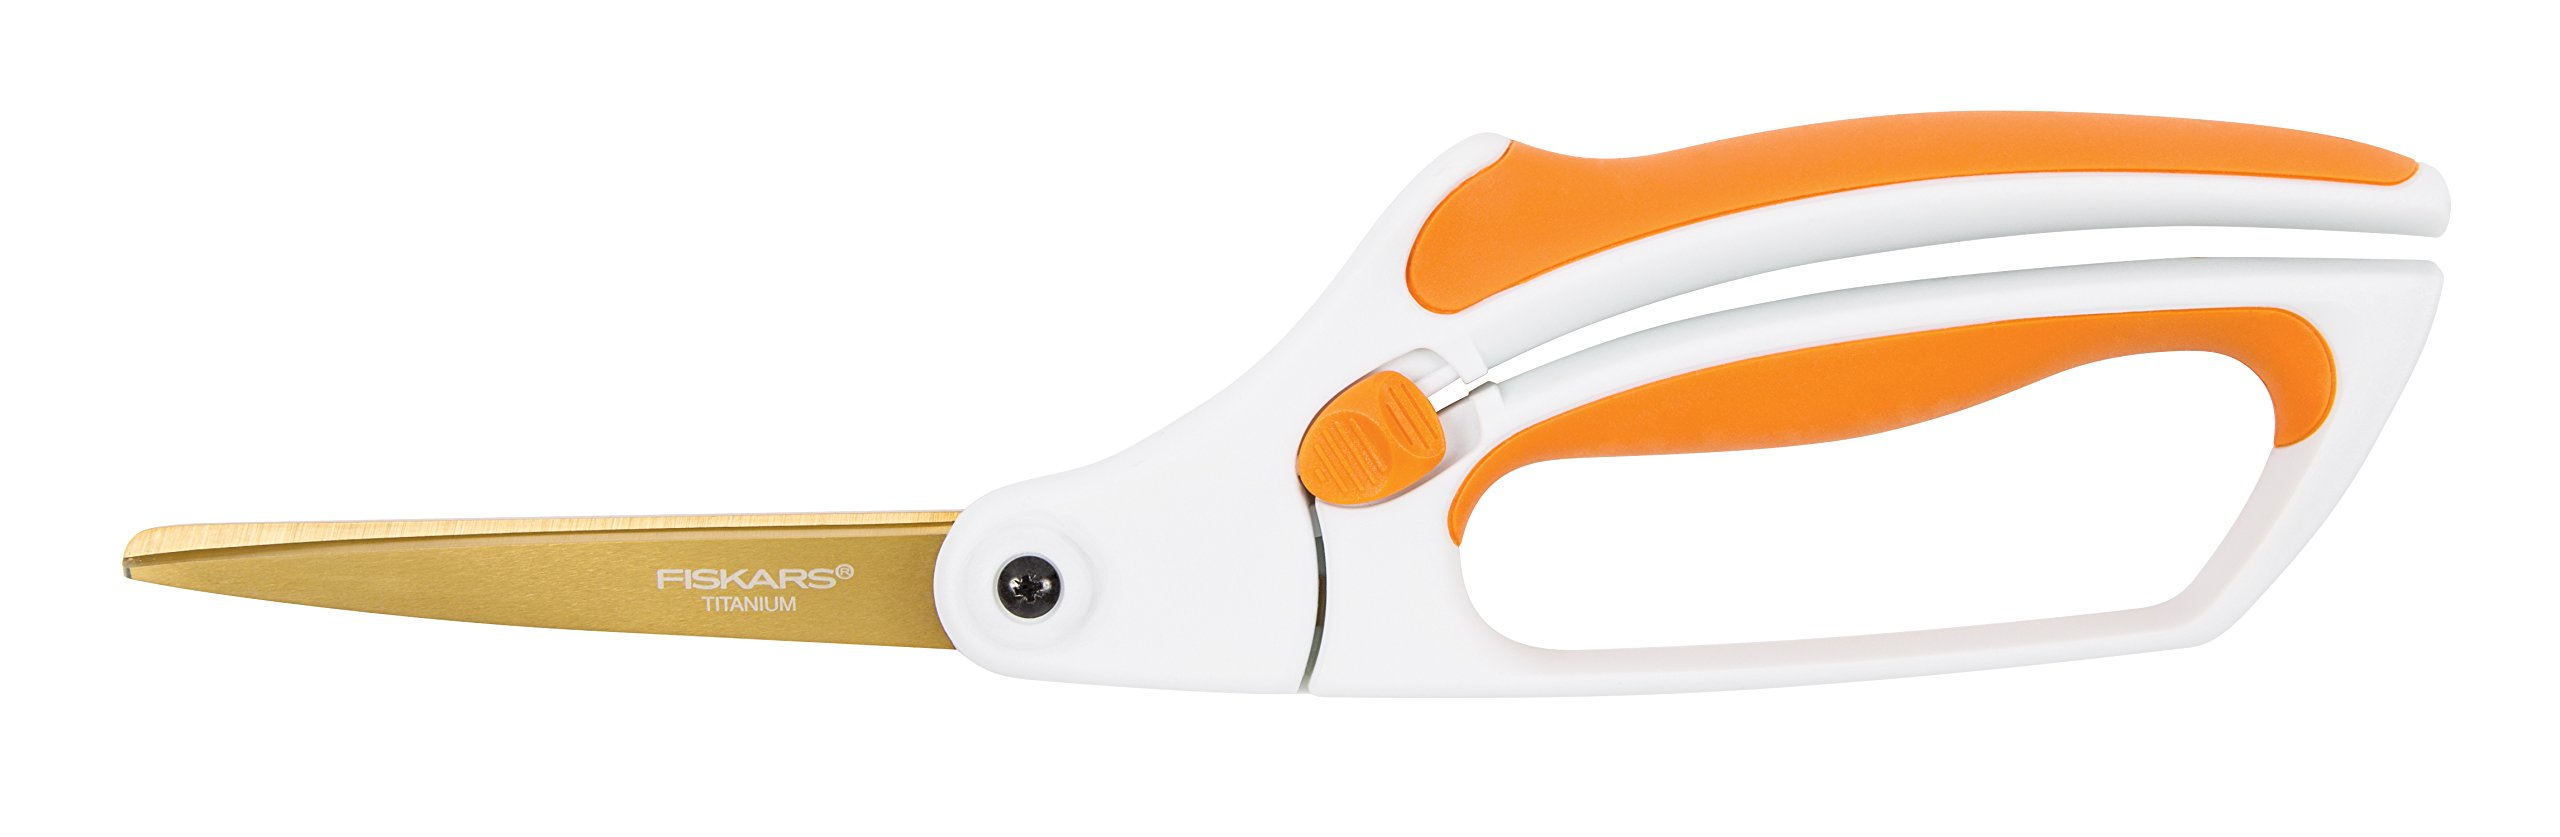 Fiskars 12-71787097J Titanium Easy Action Scissors, 10 Inch, Orange and White by Fiskars